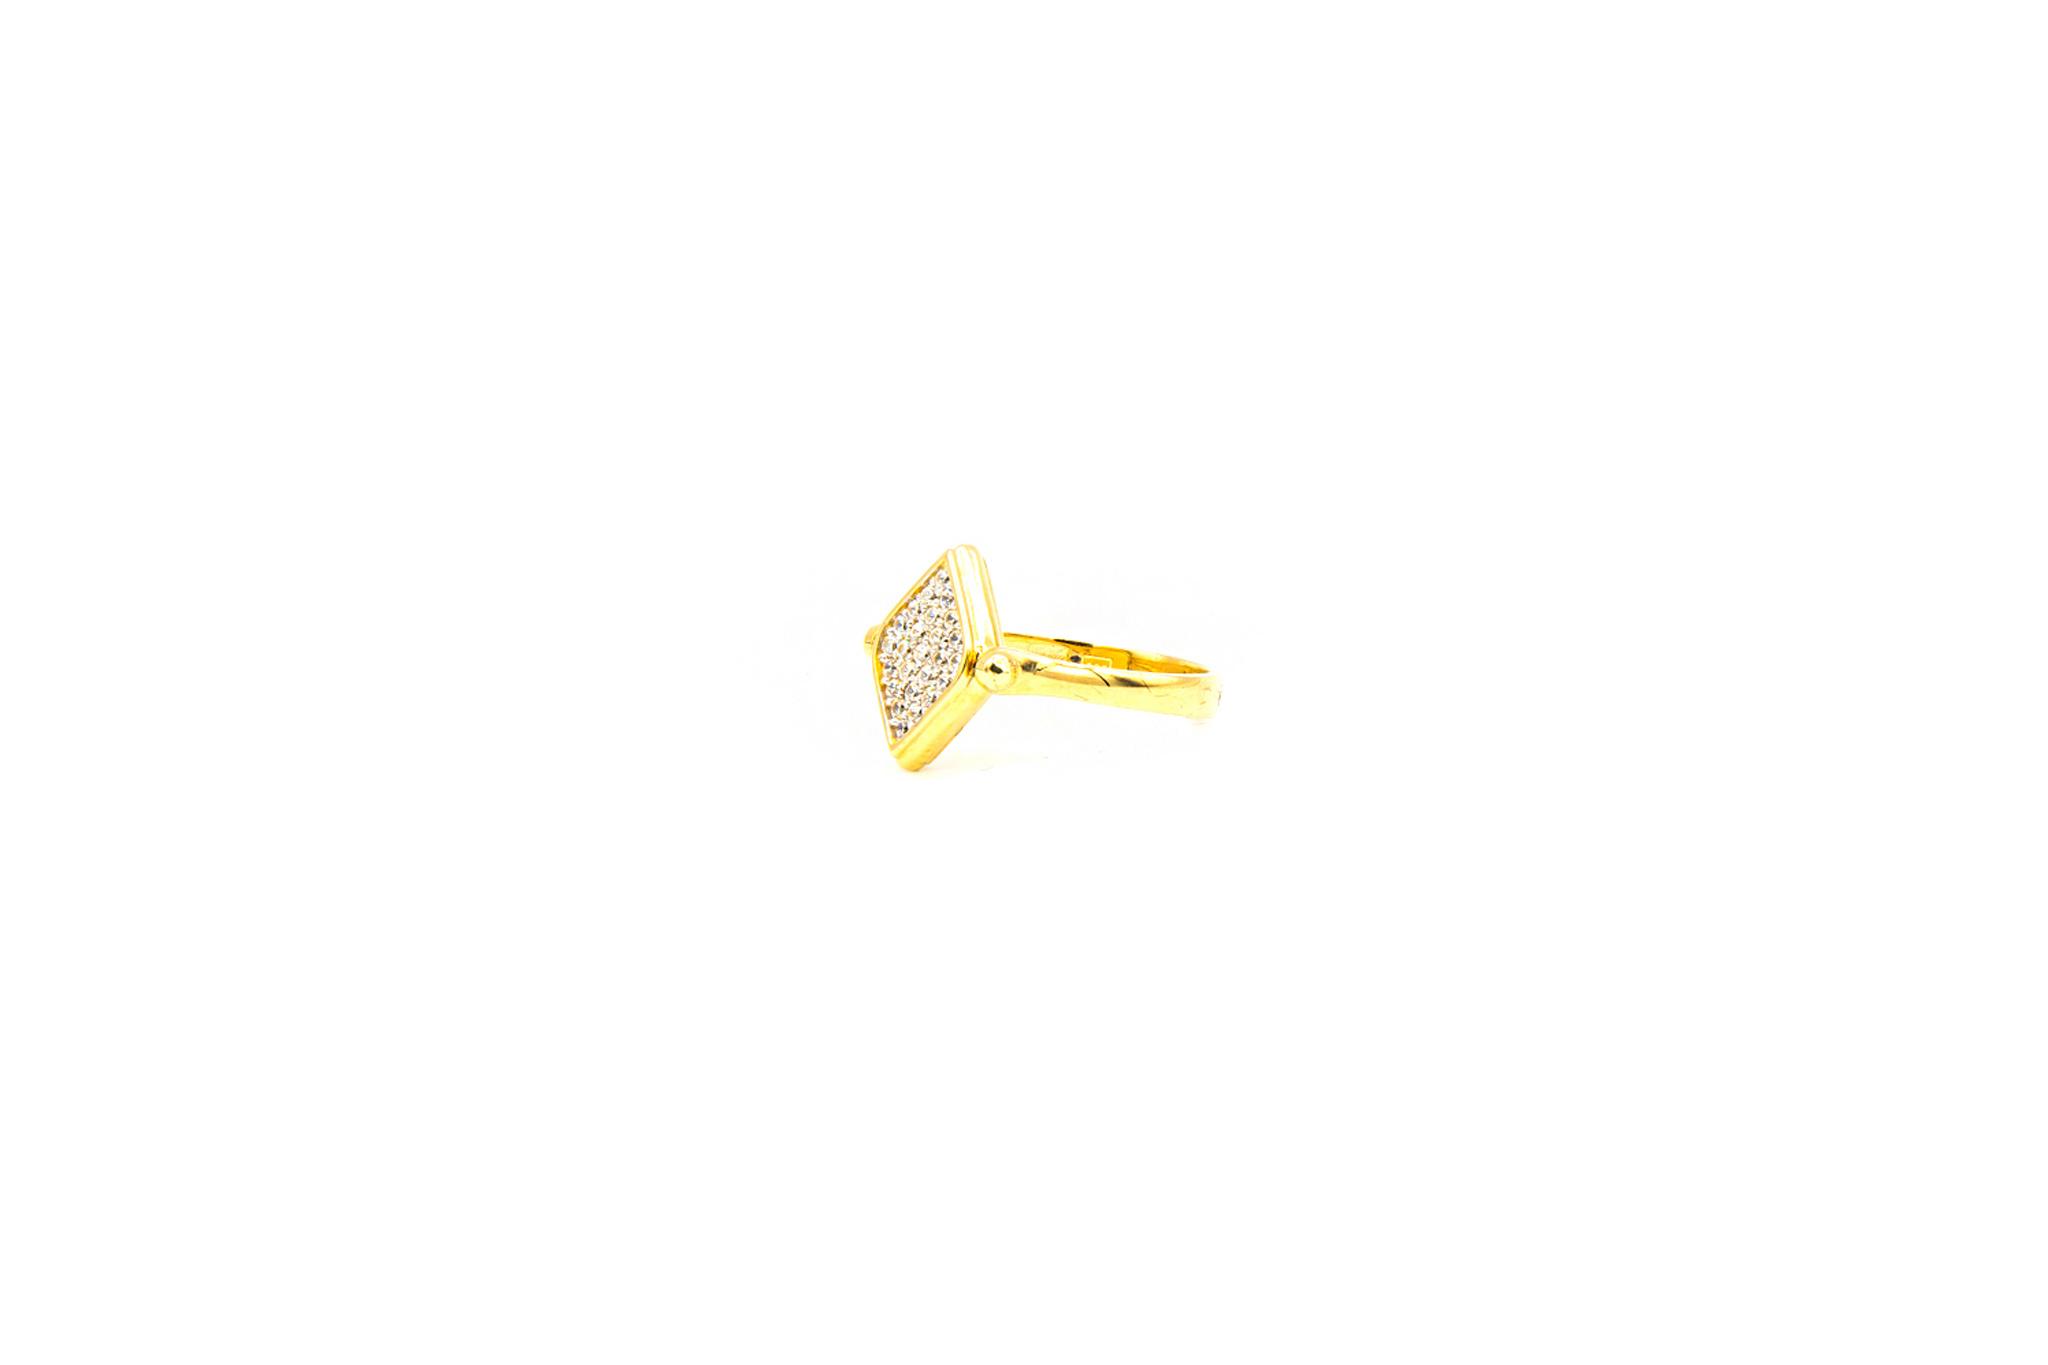 Ring beweegbare kop ruit-2